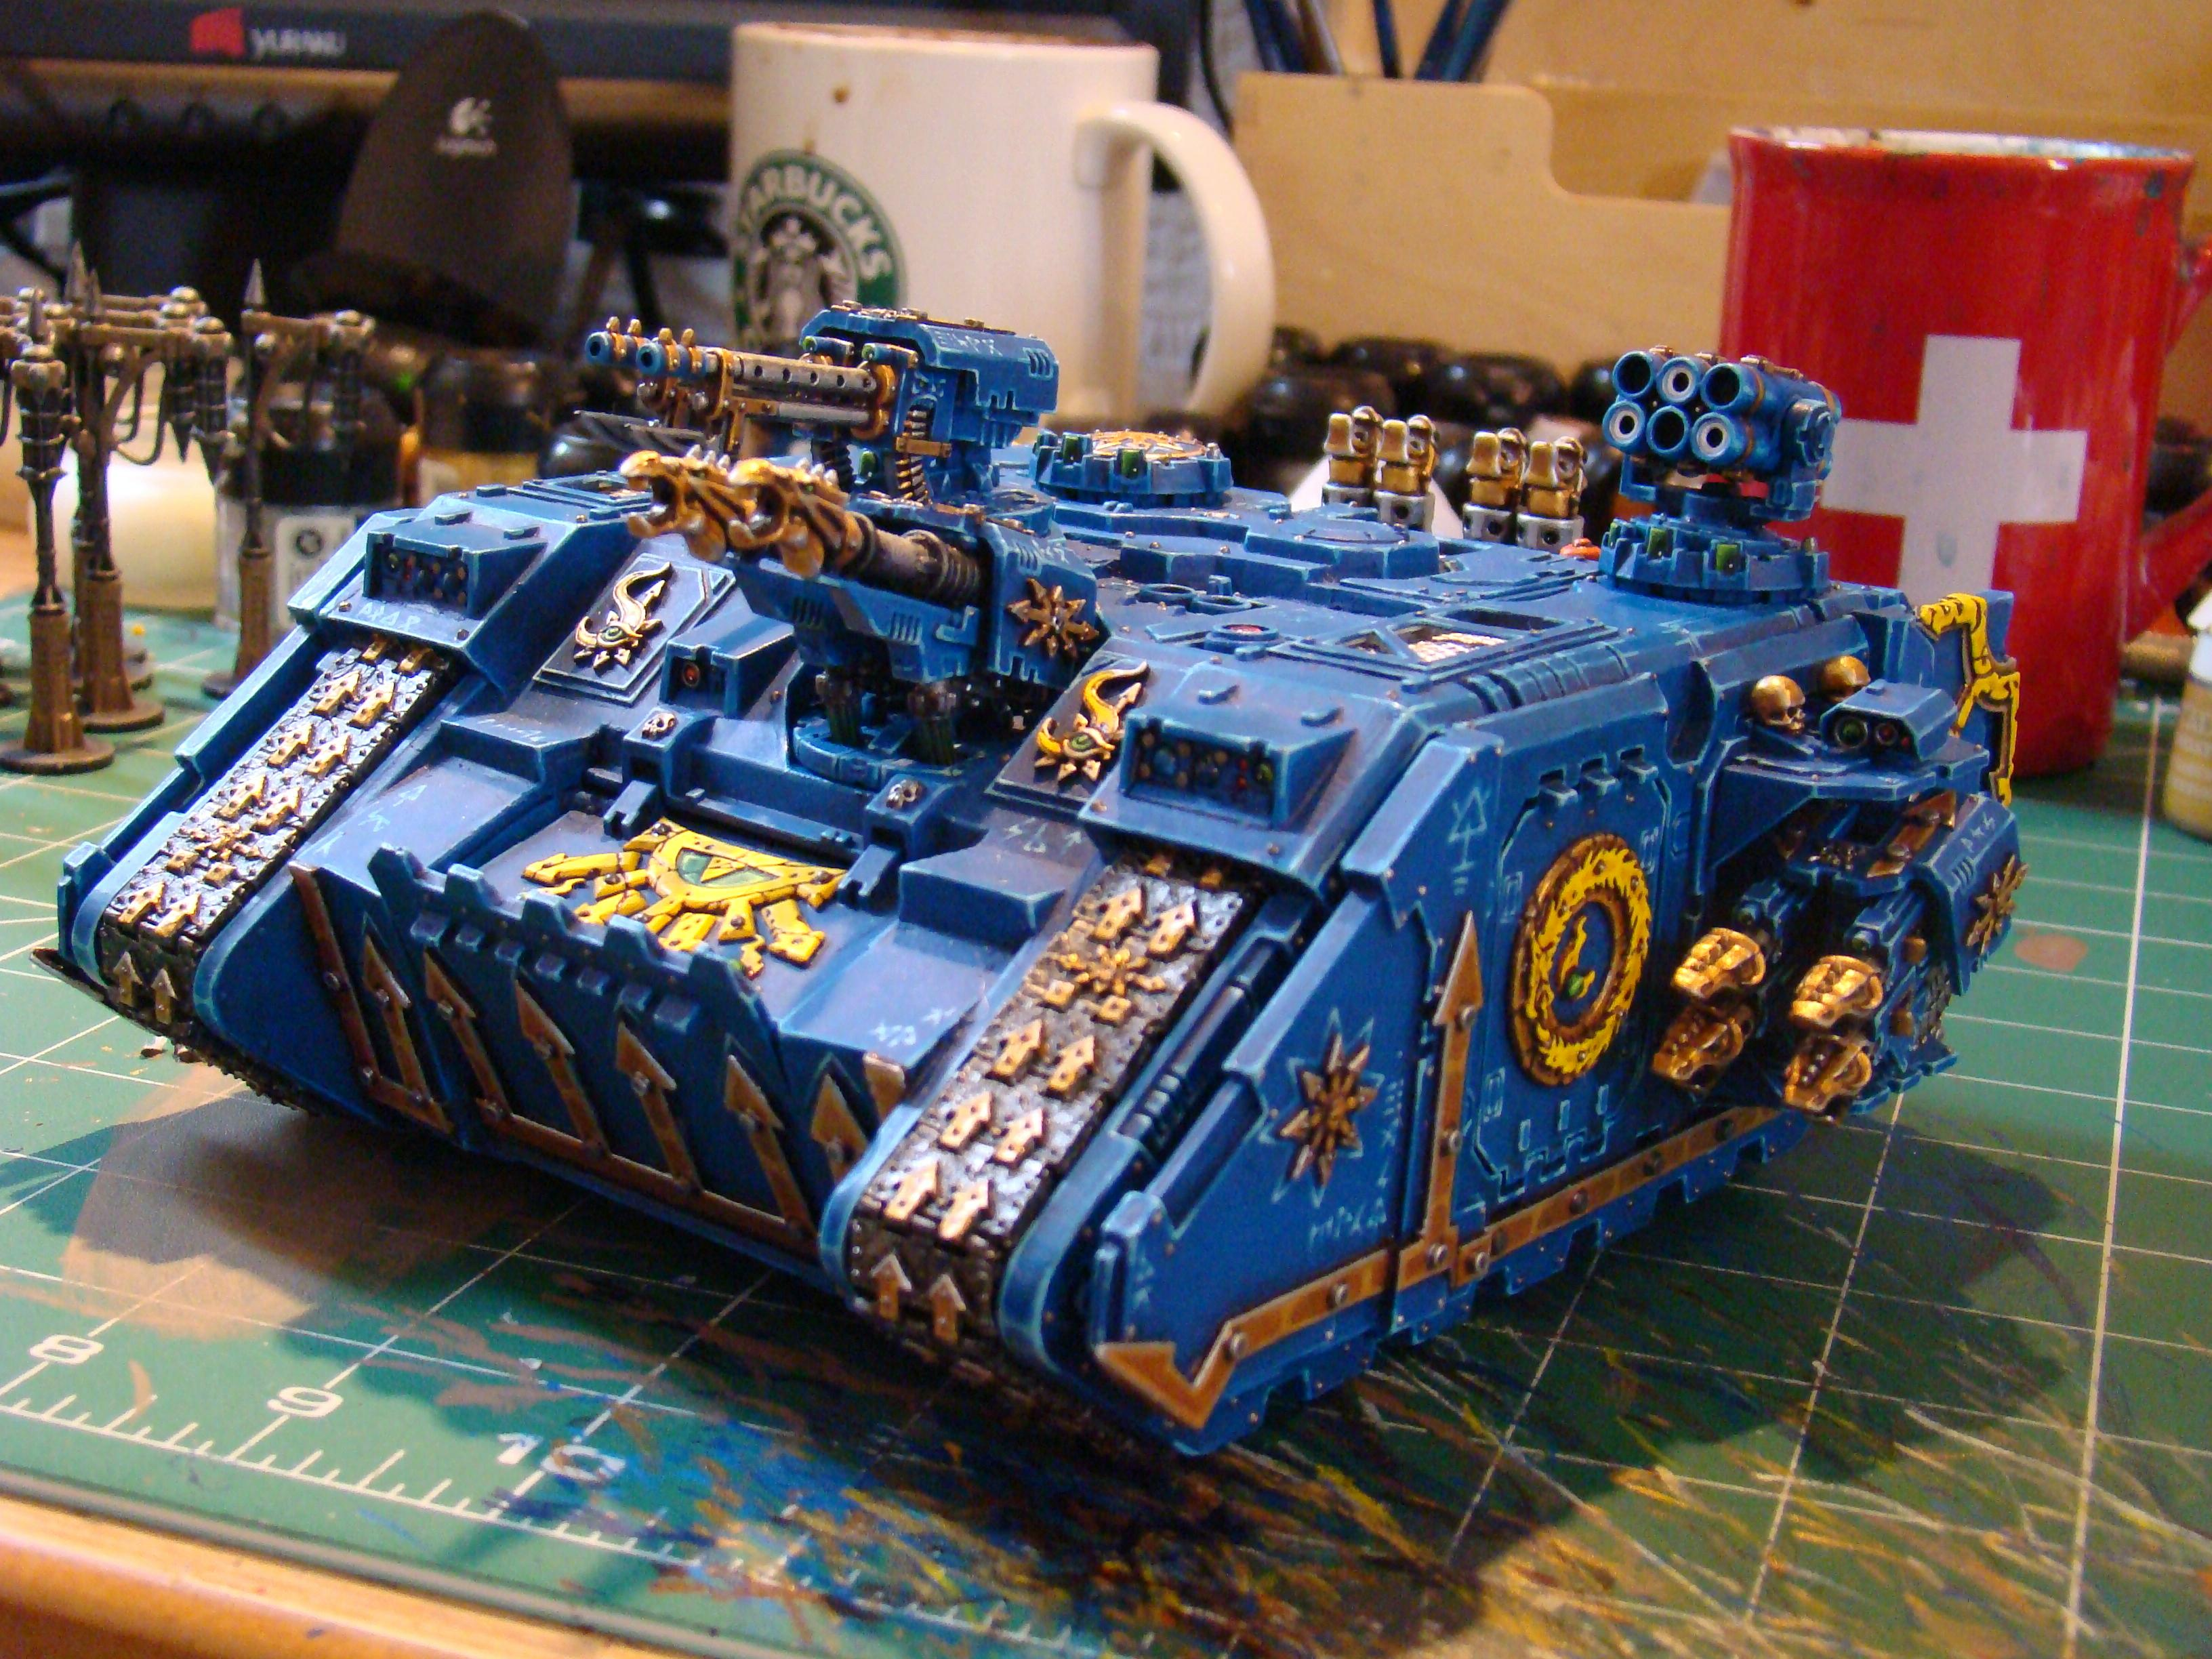 Chaos, Chaos Space Marines, Conversion, Land Raider, Tank, Thousand Sons, Tzeentch, Vehicle, Warhammer 40,000